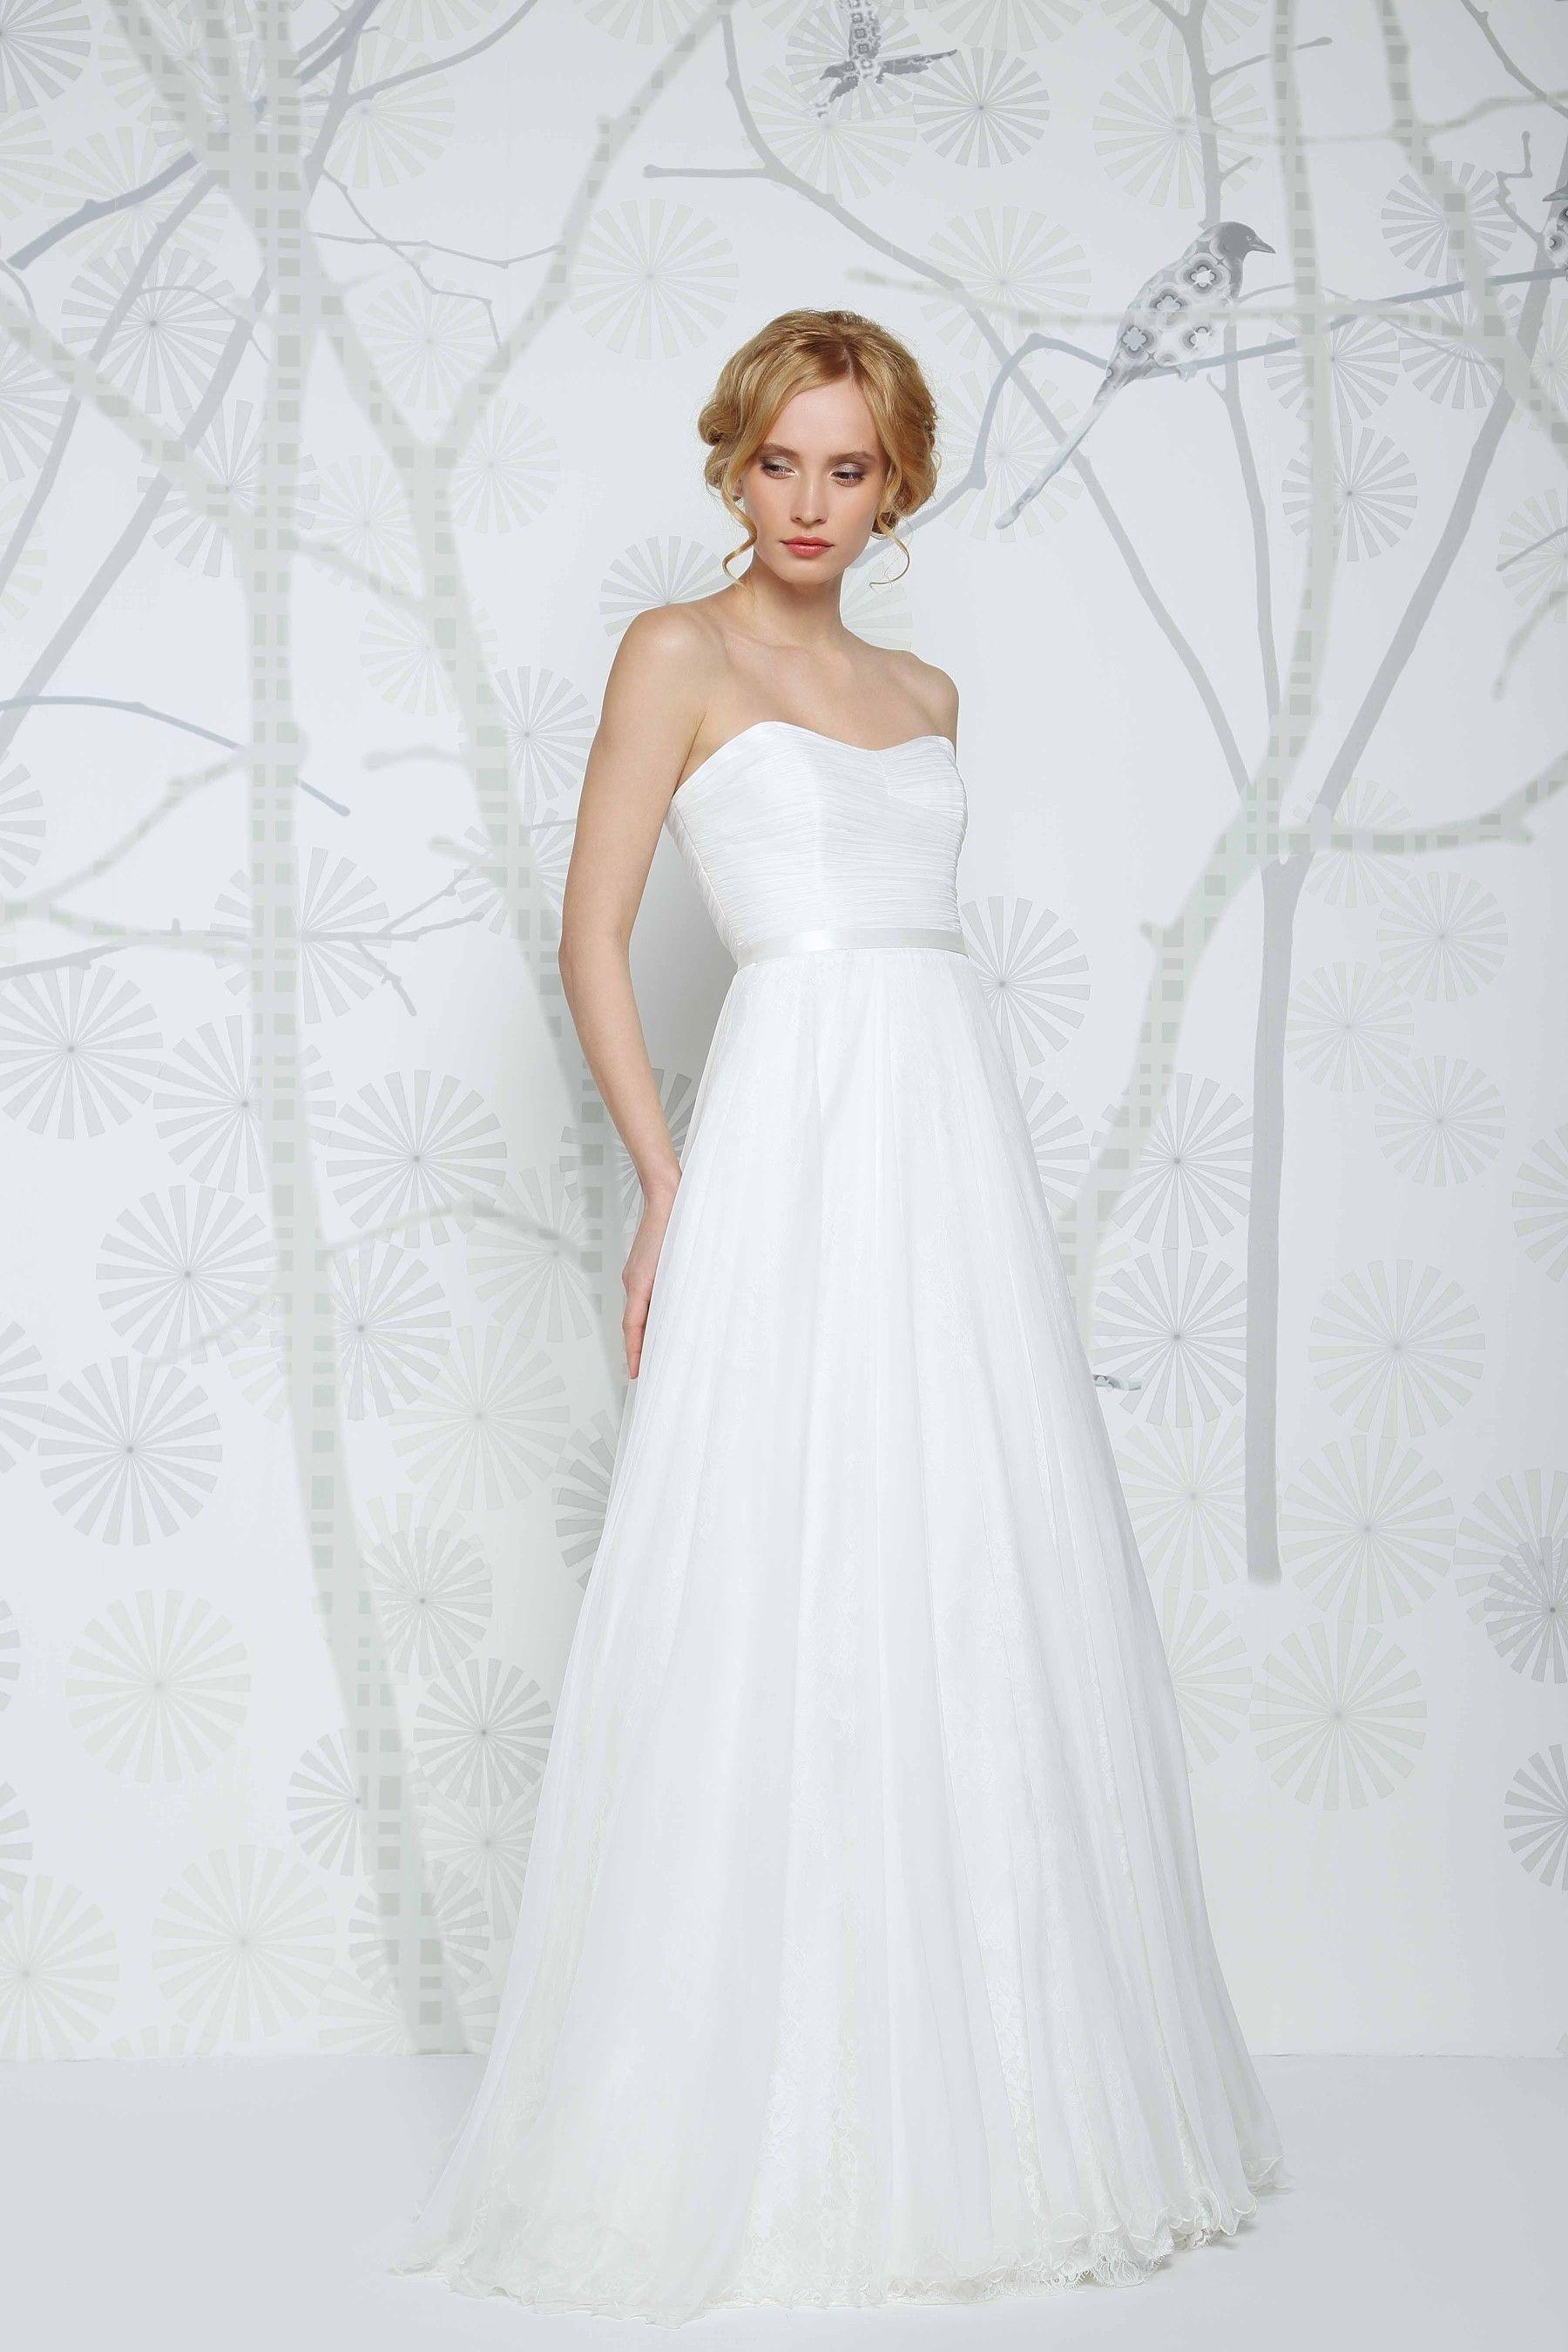 SADONI wedding dress ERIKO B with romantic sweetheart neckline